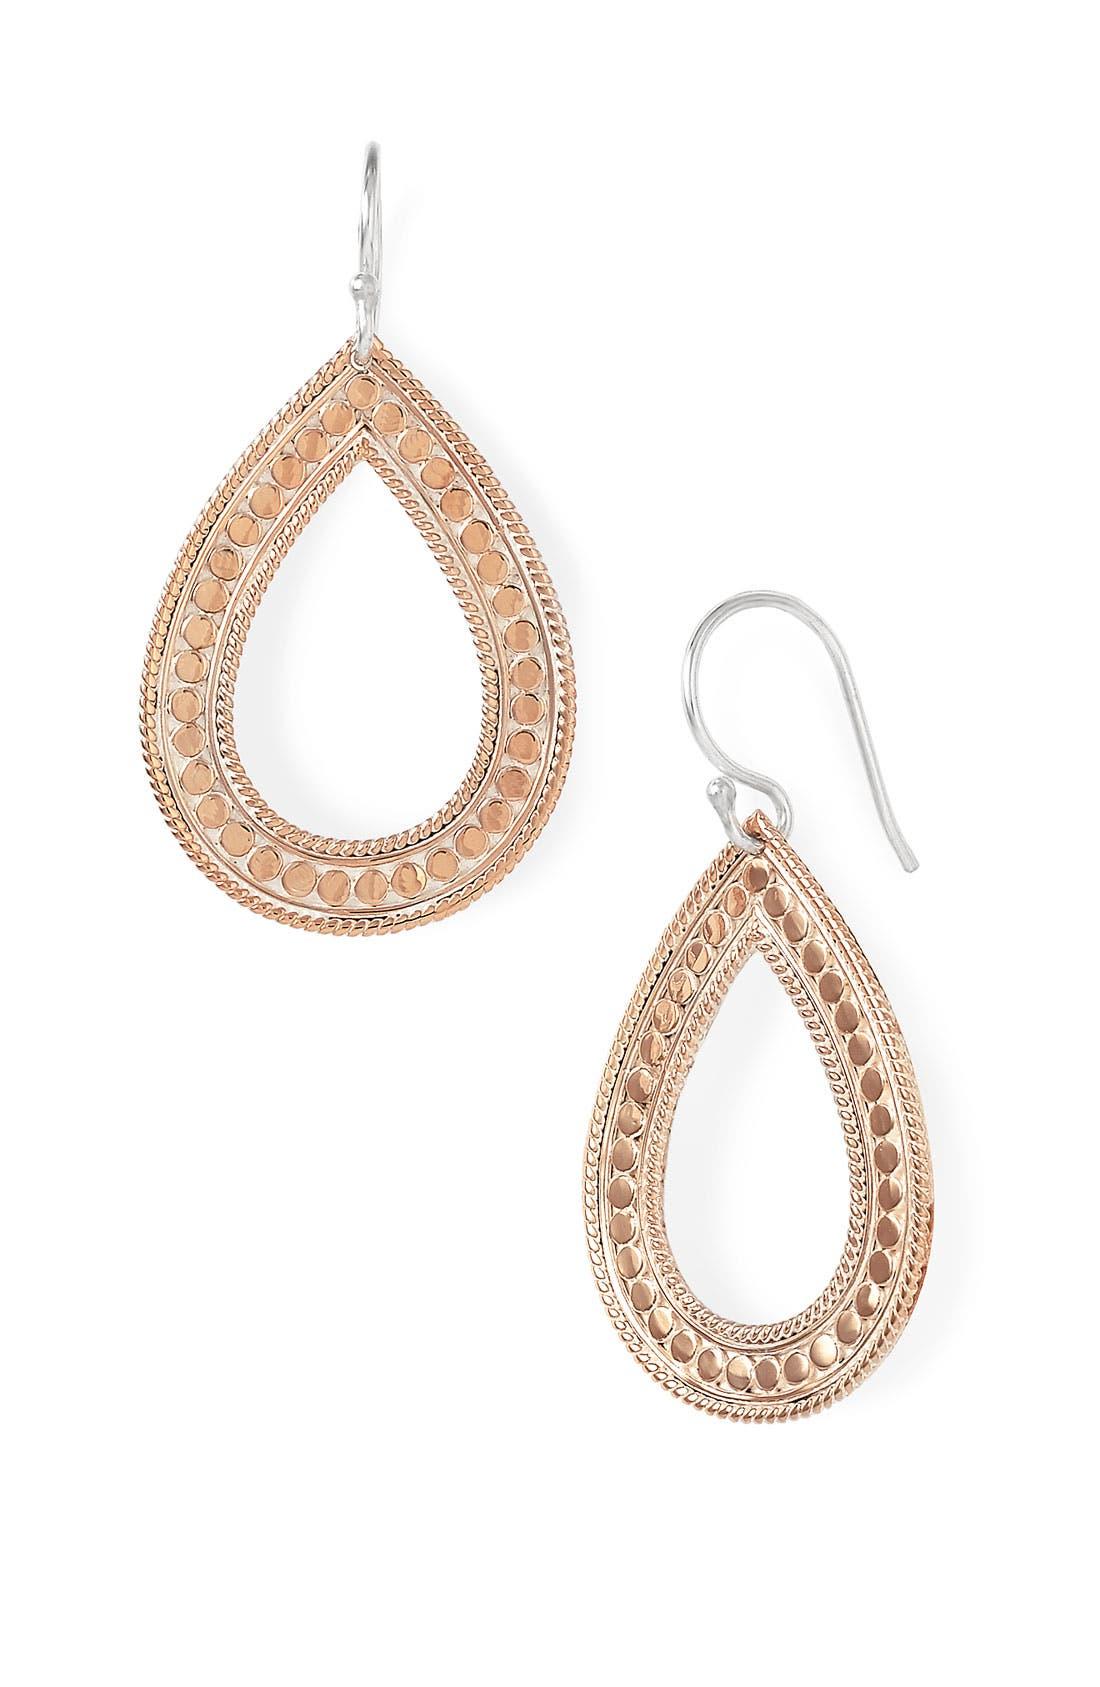 Main Image - Anna Beck 'Timor' Open Teardrop Earrings (Nordstrom Exclusive)